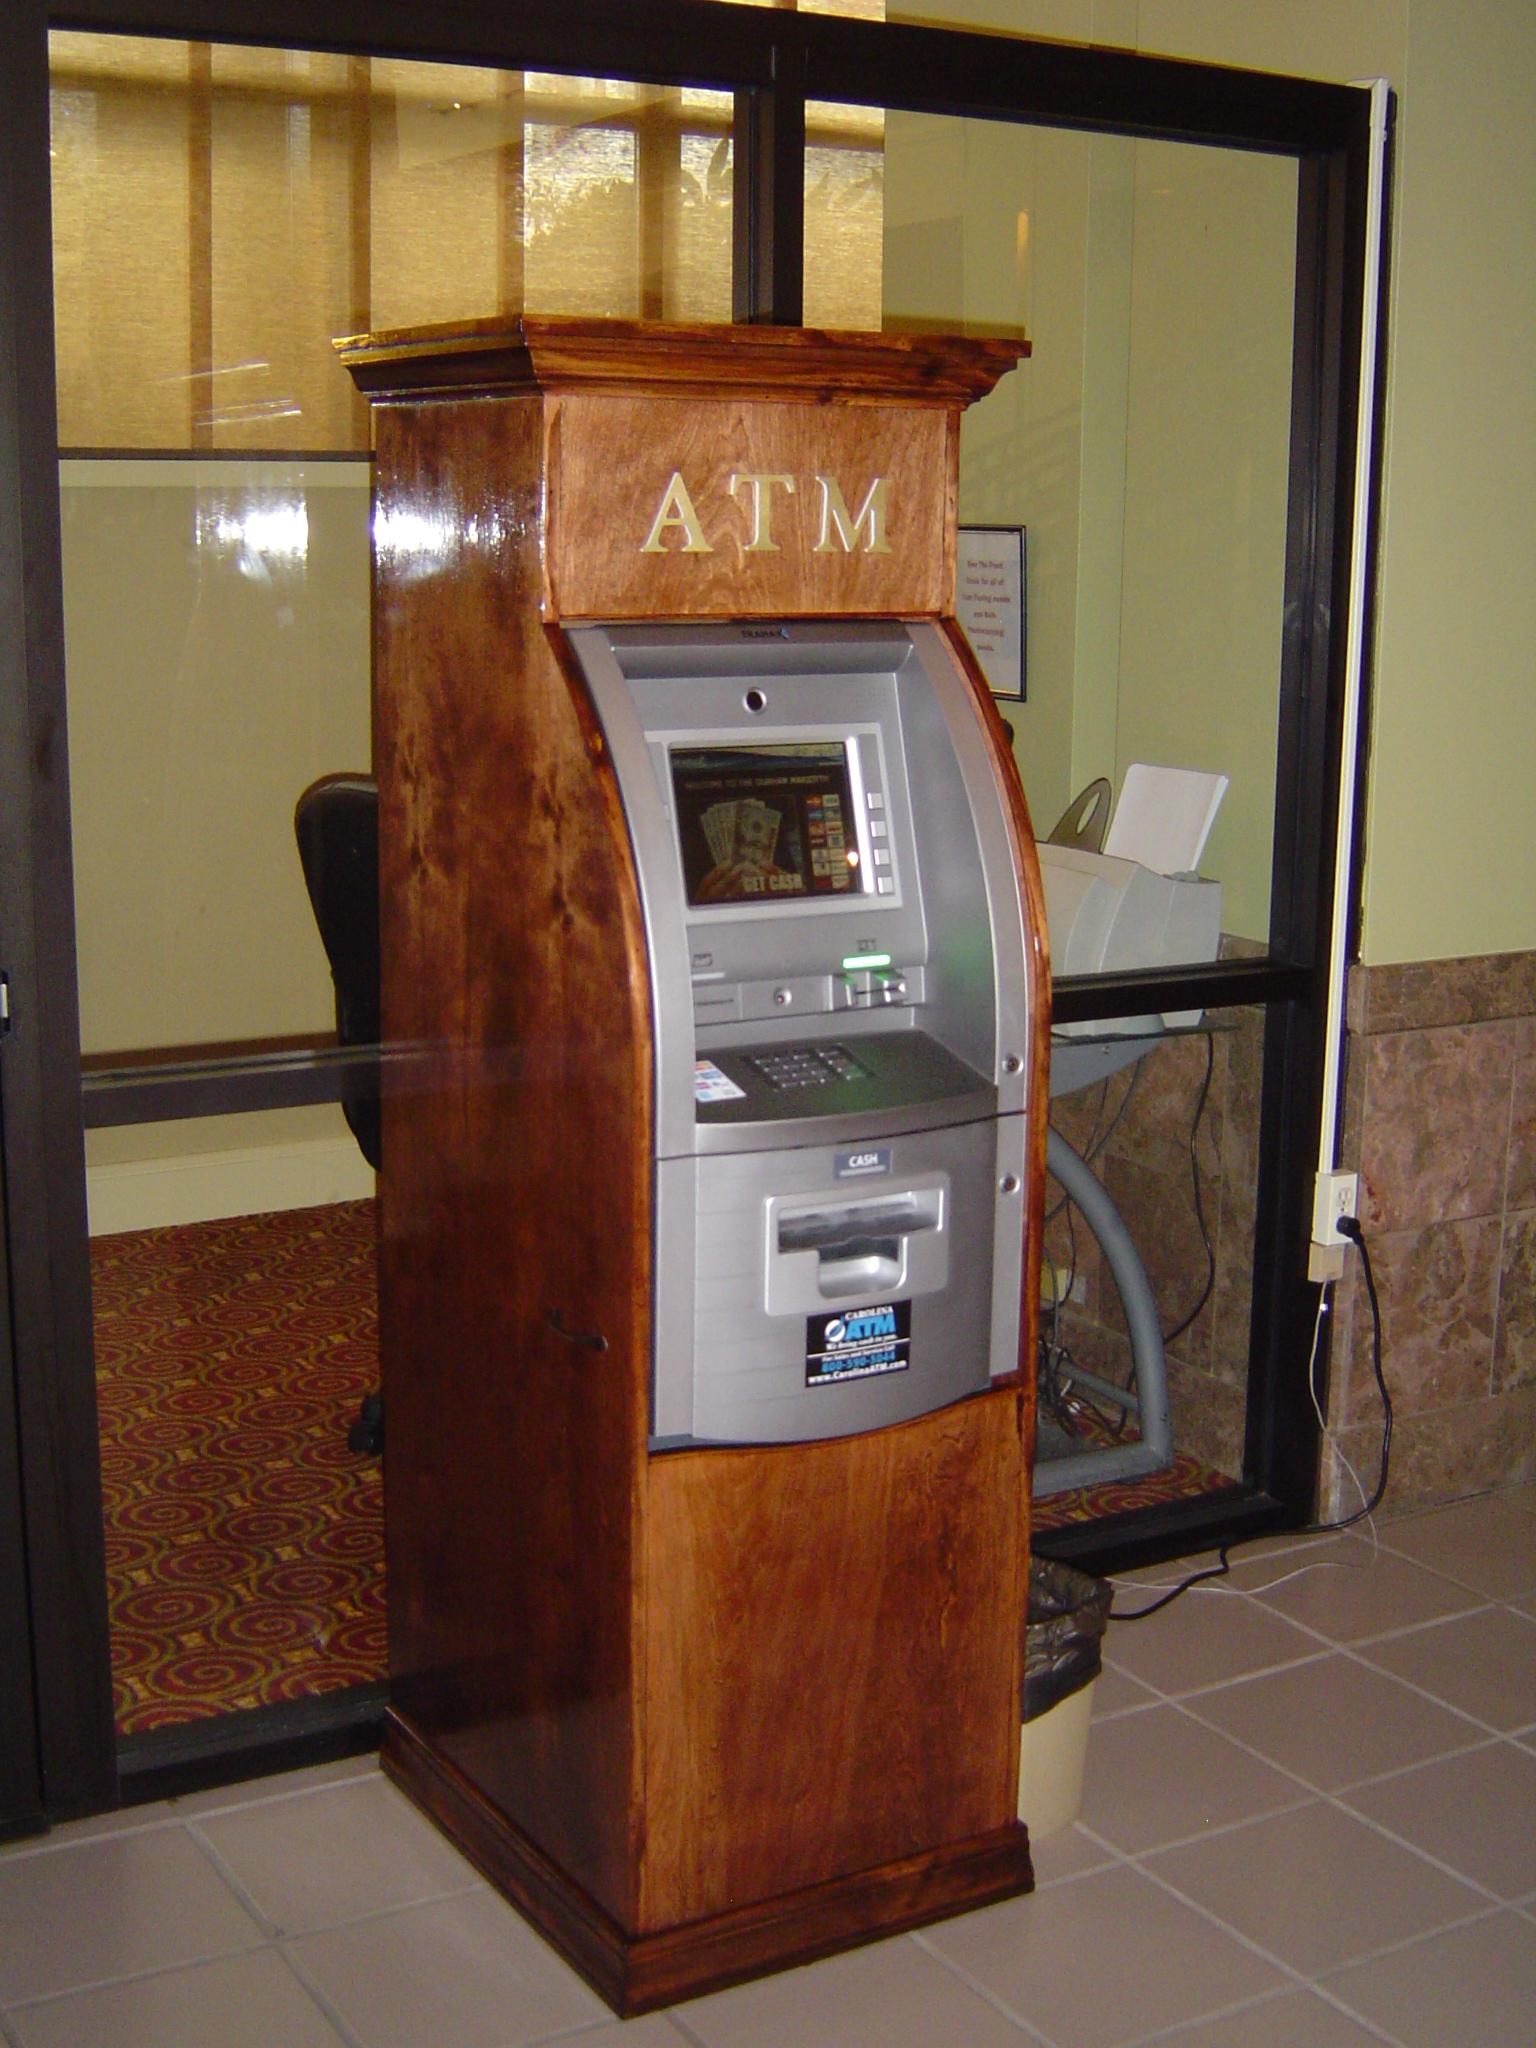 Carolina ATM - ATM Services & Solutions | Gallery - Mobile ATMS & Festivals 72